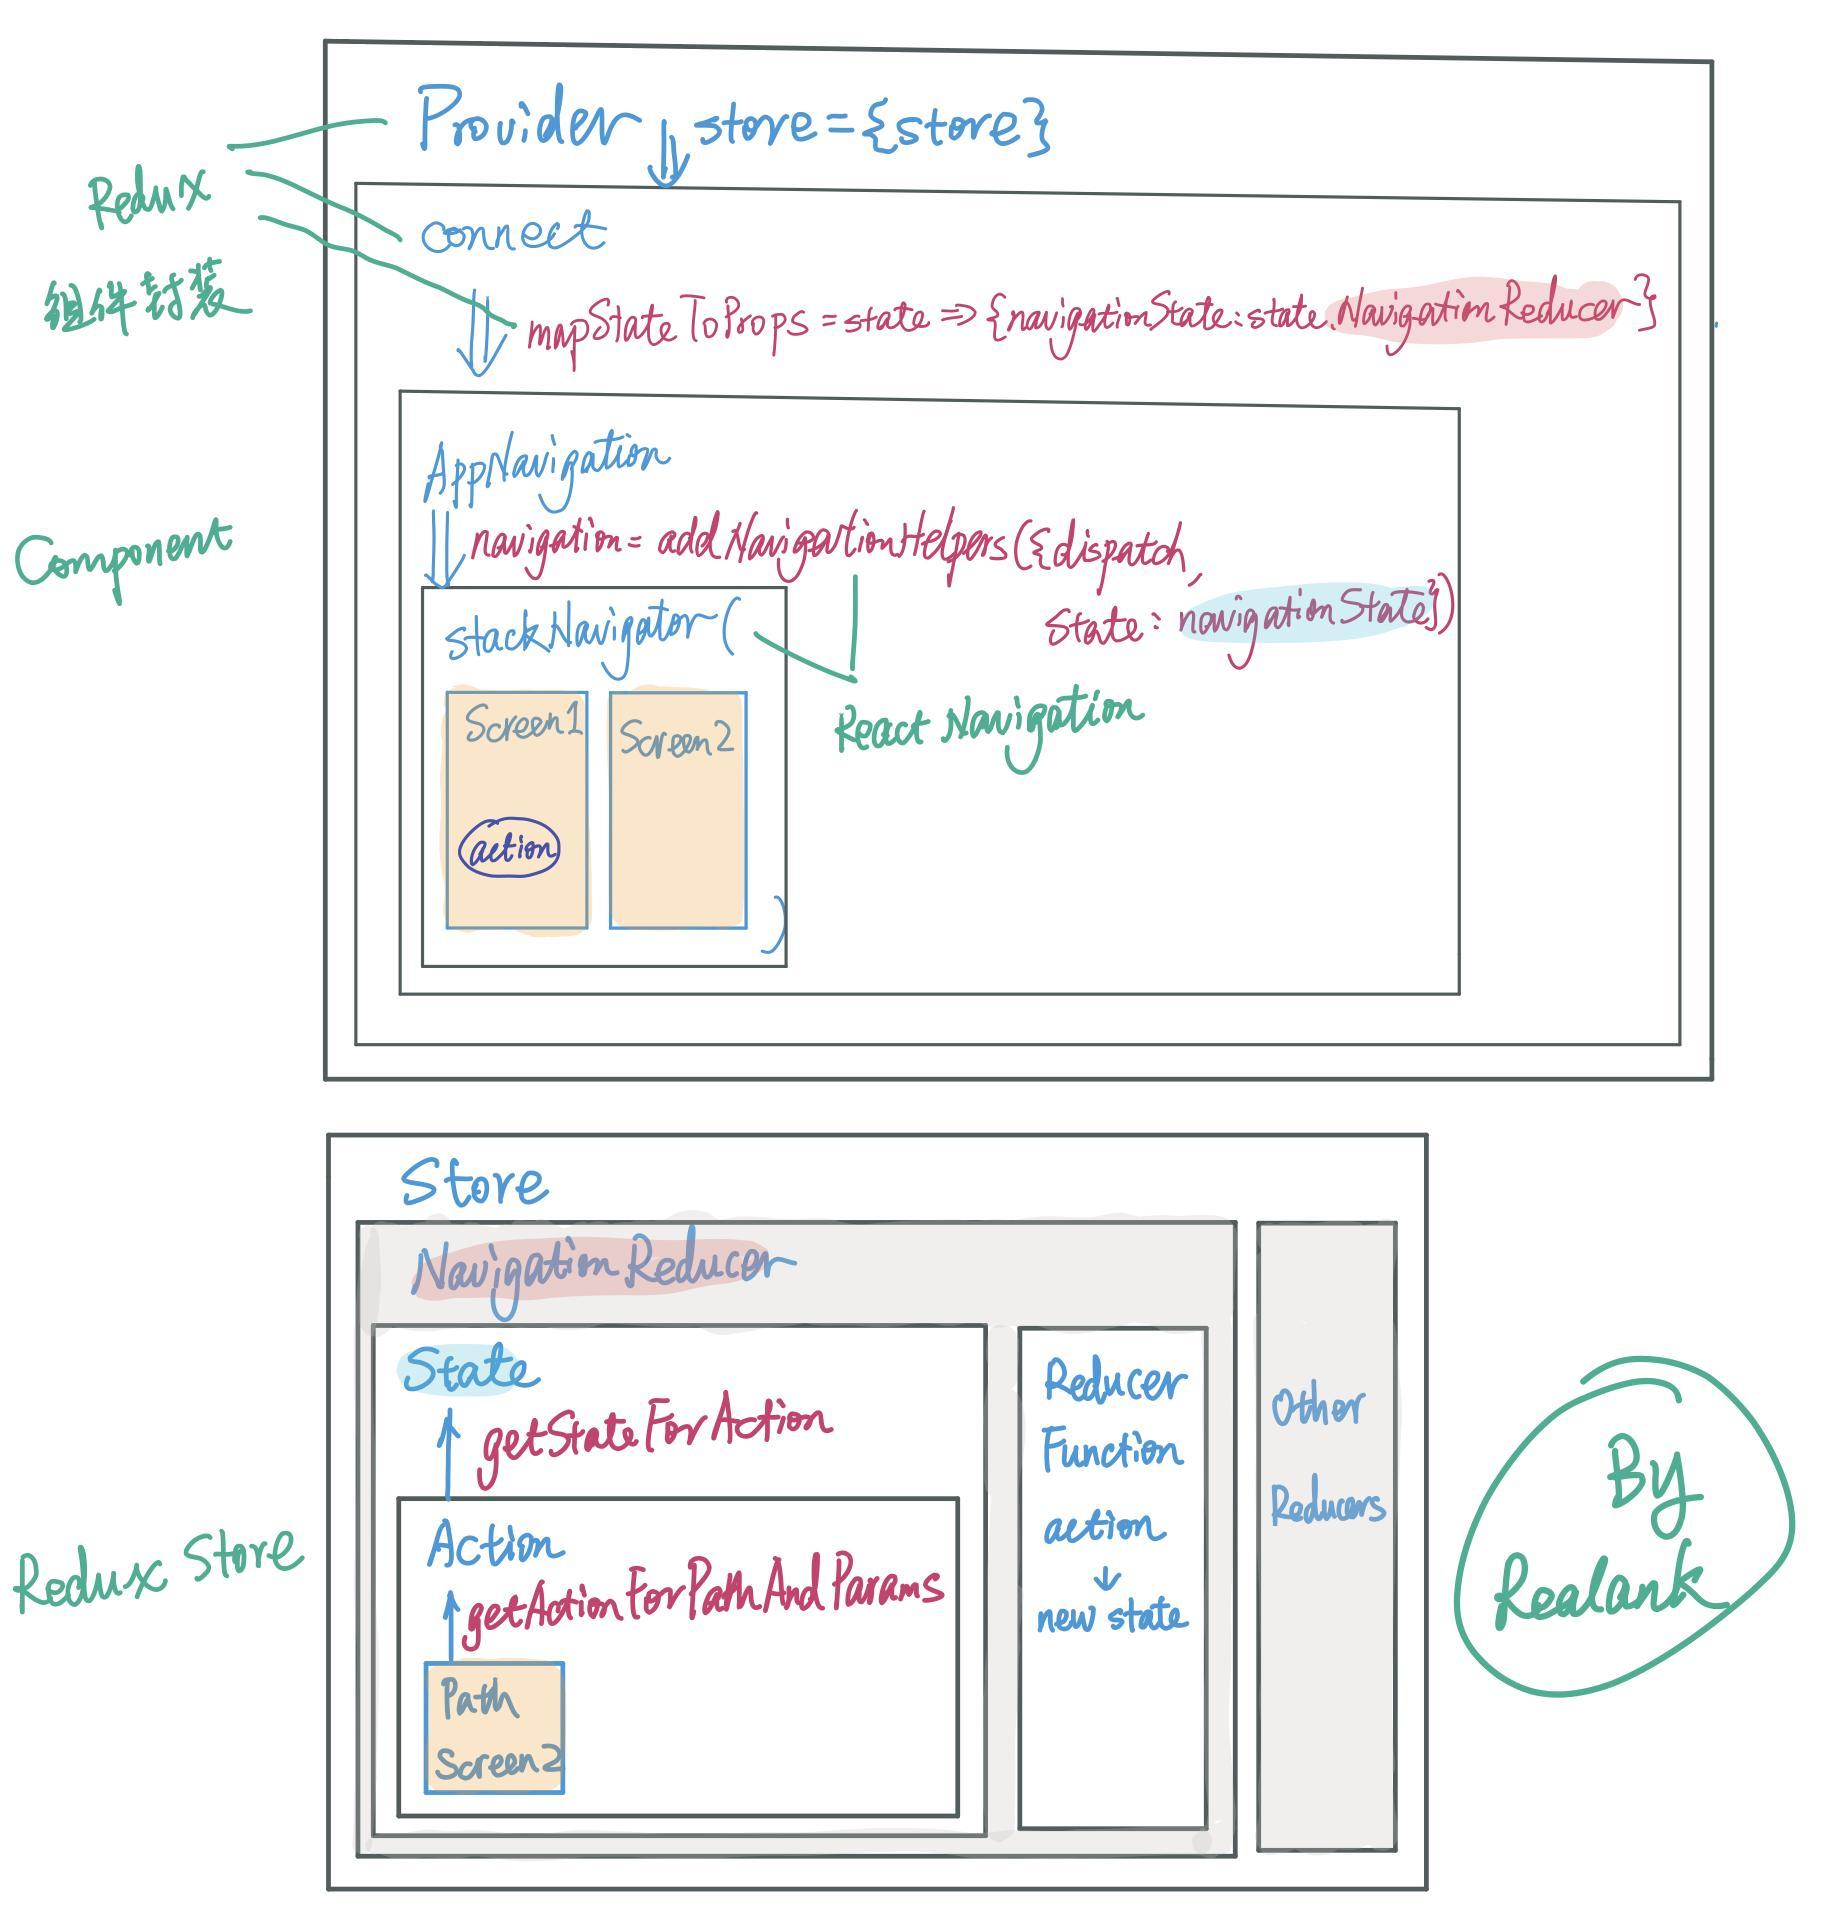 RN study notes 3-Redux + React Navigation - Programmer Sought